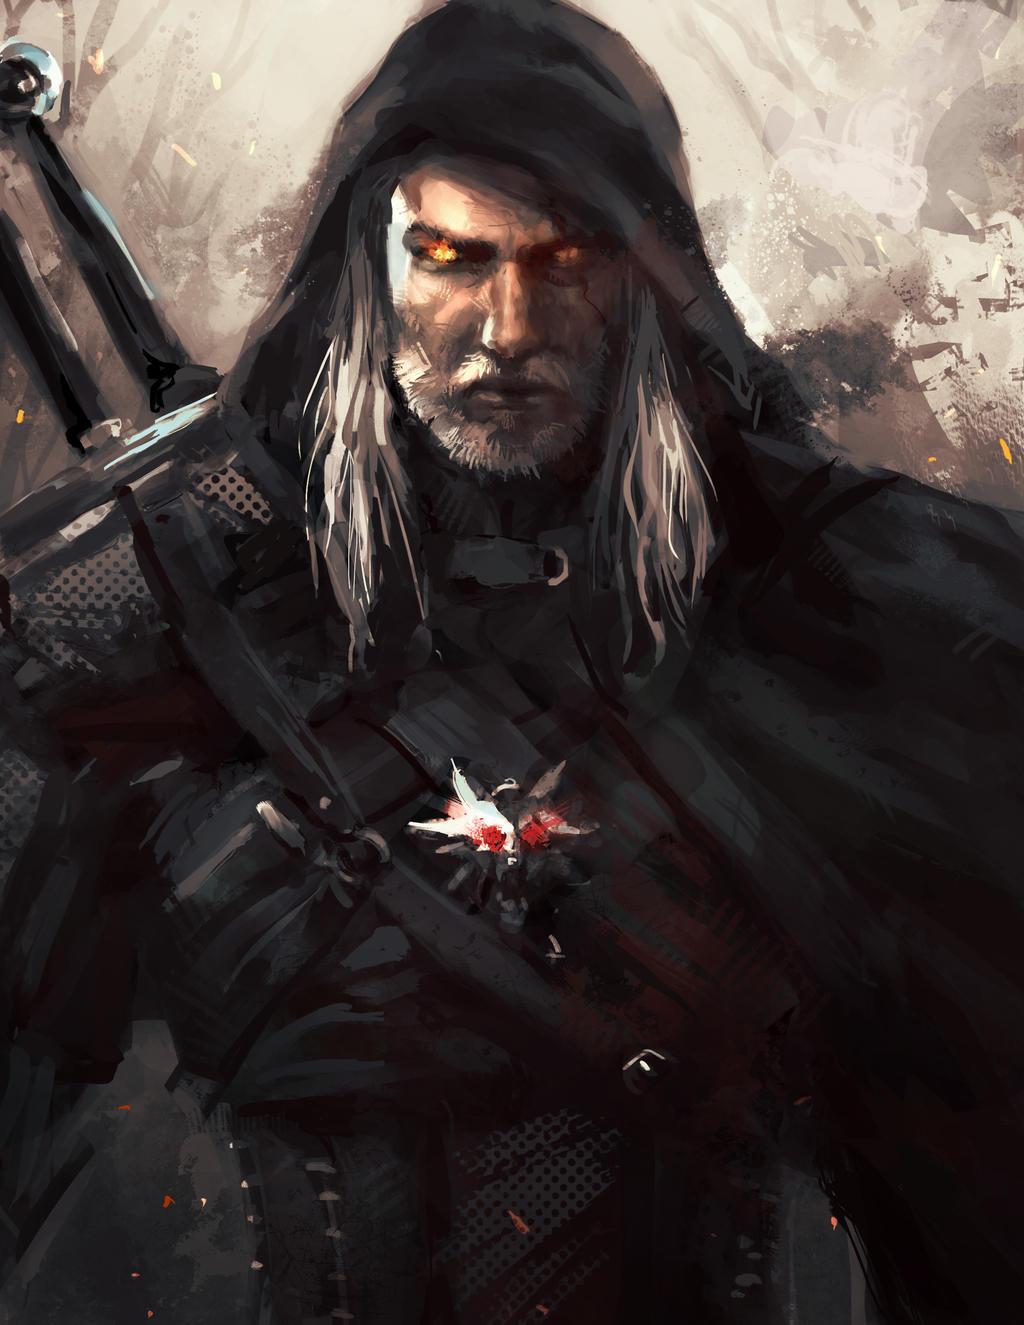 ✮ SPIRIT BRINGERS: THE SIDER STORIES (ANTES LABERINTO DE LA DEMENCIA ☠) - Página 5 Geralt_of_rivia_by_leopinheiro-d84j1ir